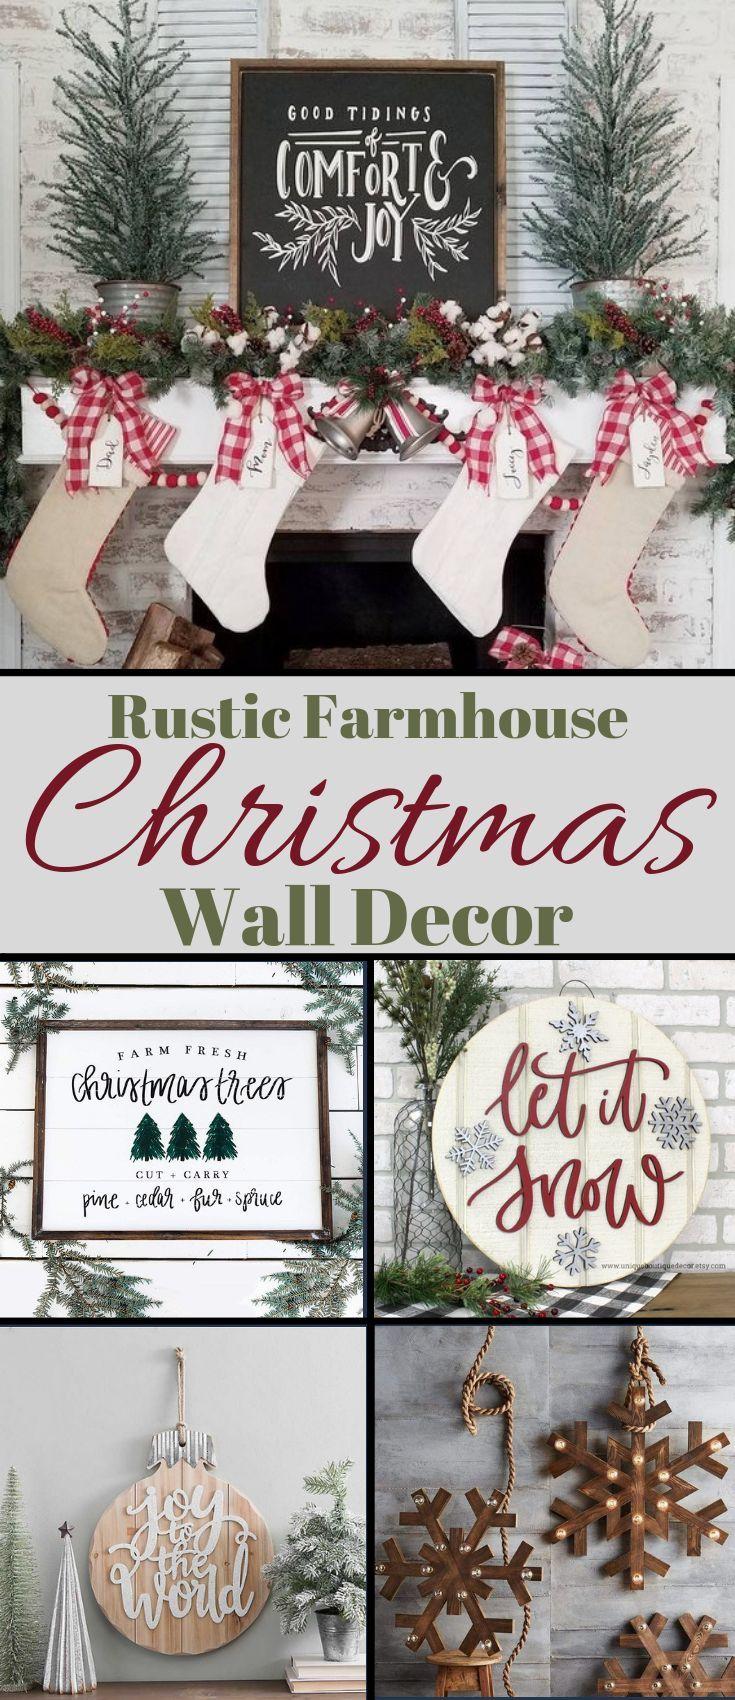 Rustic Farmhouse Christmas Wall Decor My Cozy Colorado Christmas Wall Decor Farmhouse Christmas Christmas Decorations Rustic